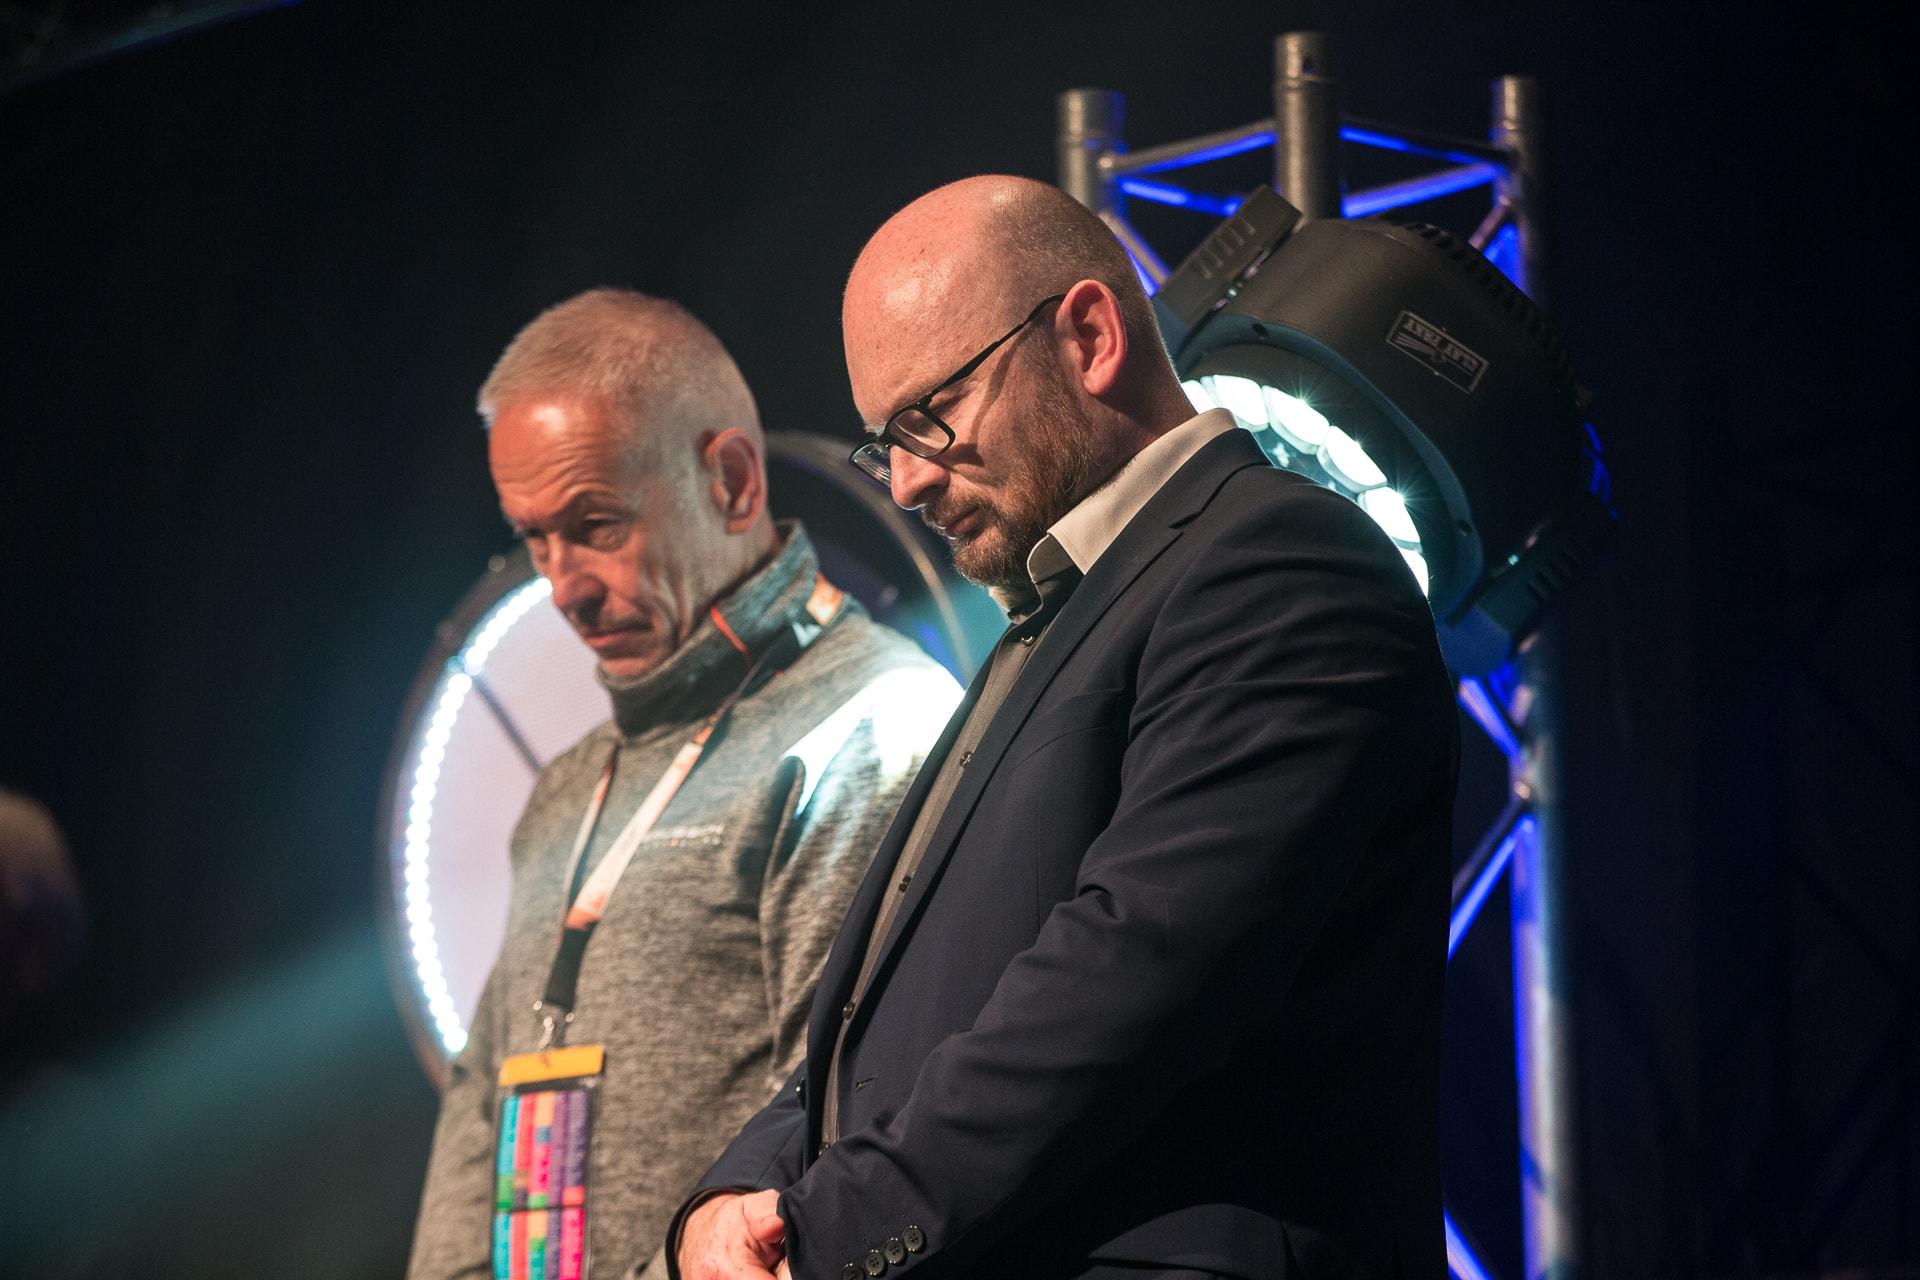 Piotr Pustelnik i Maciej Sokołowski